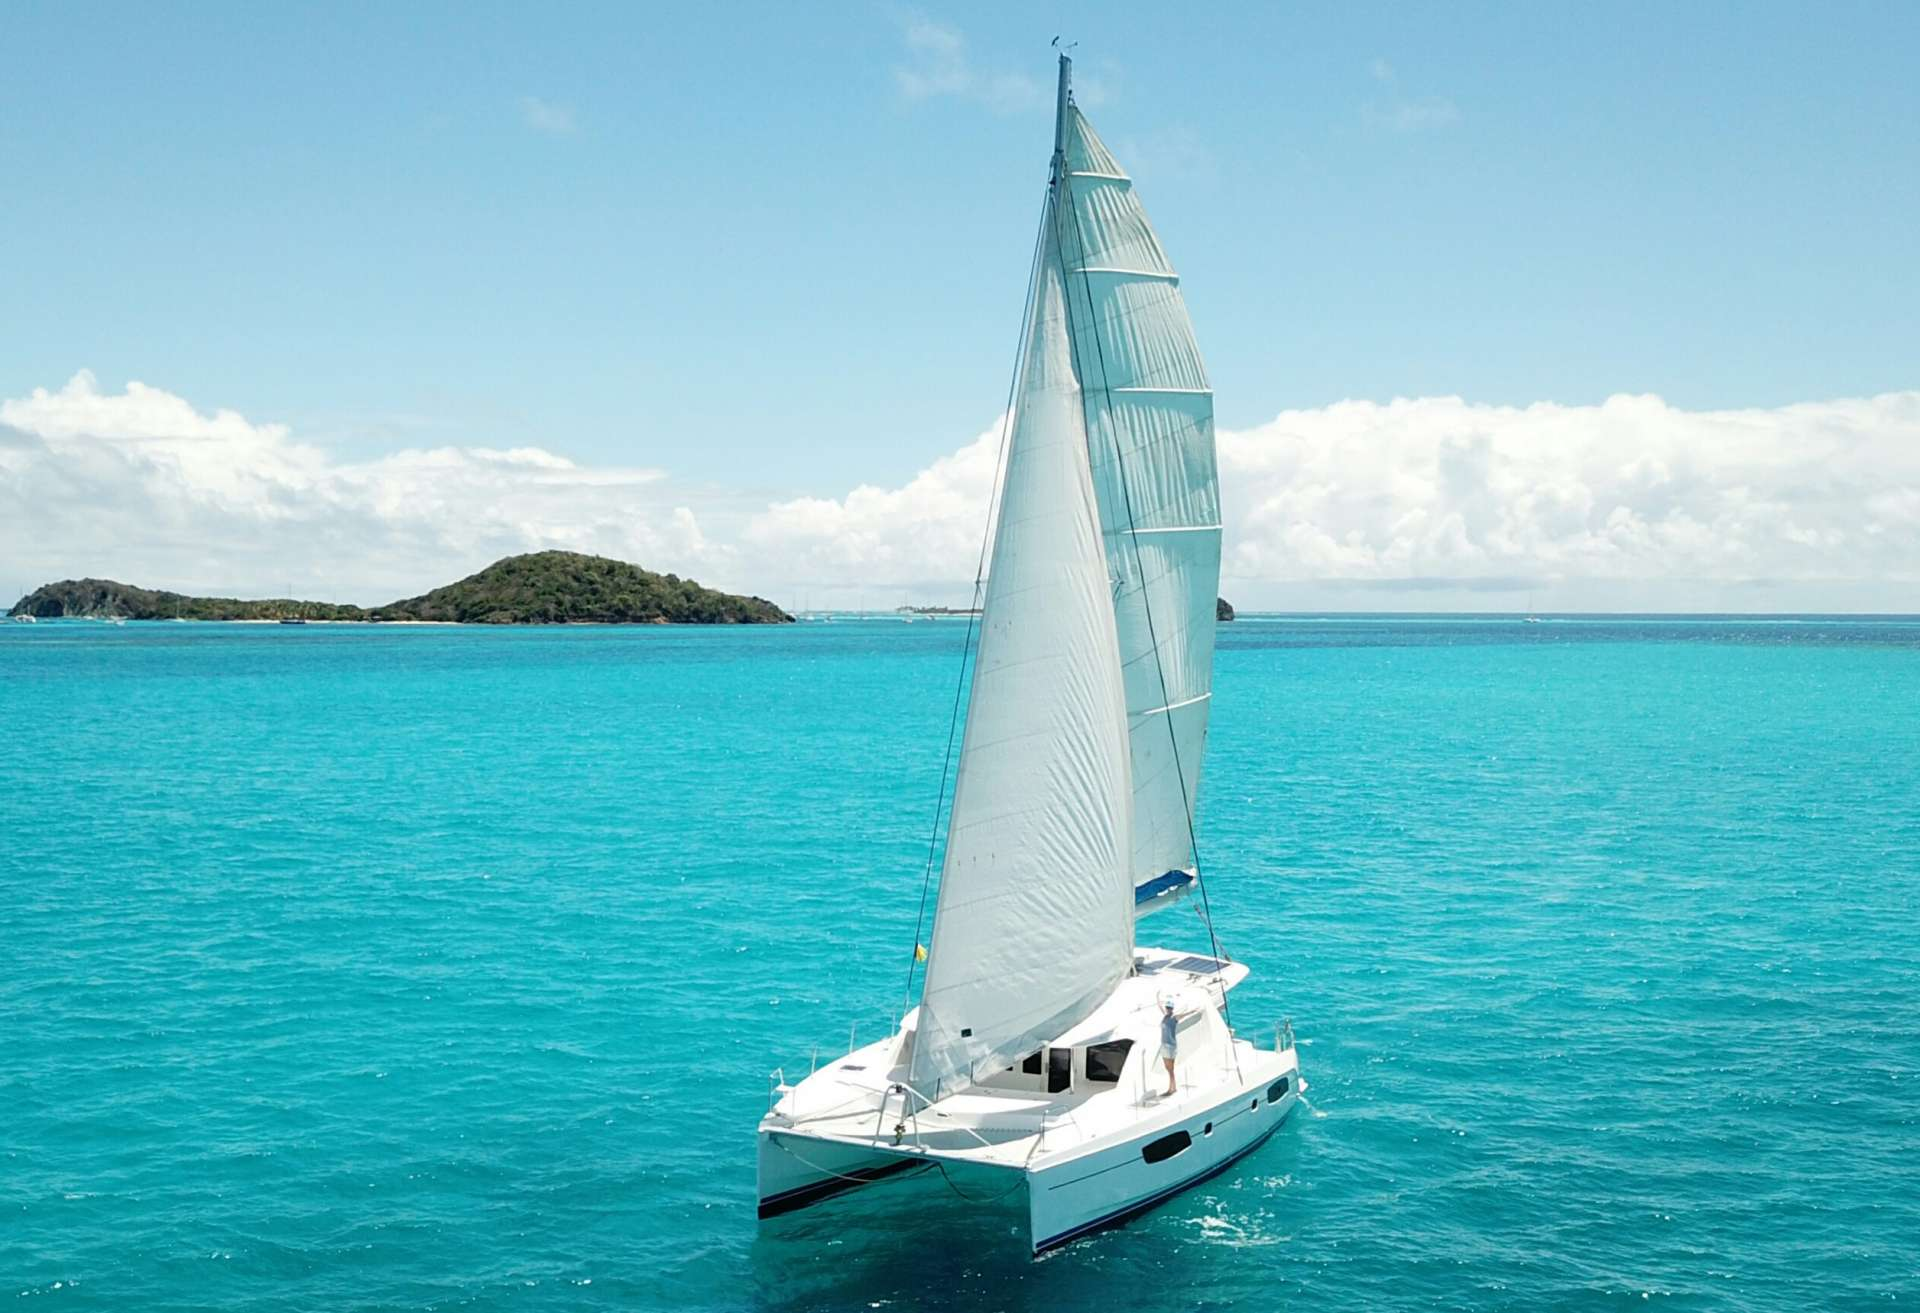 Sail Ionian Yacht Groovy (43ft)